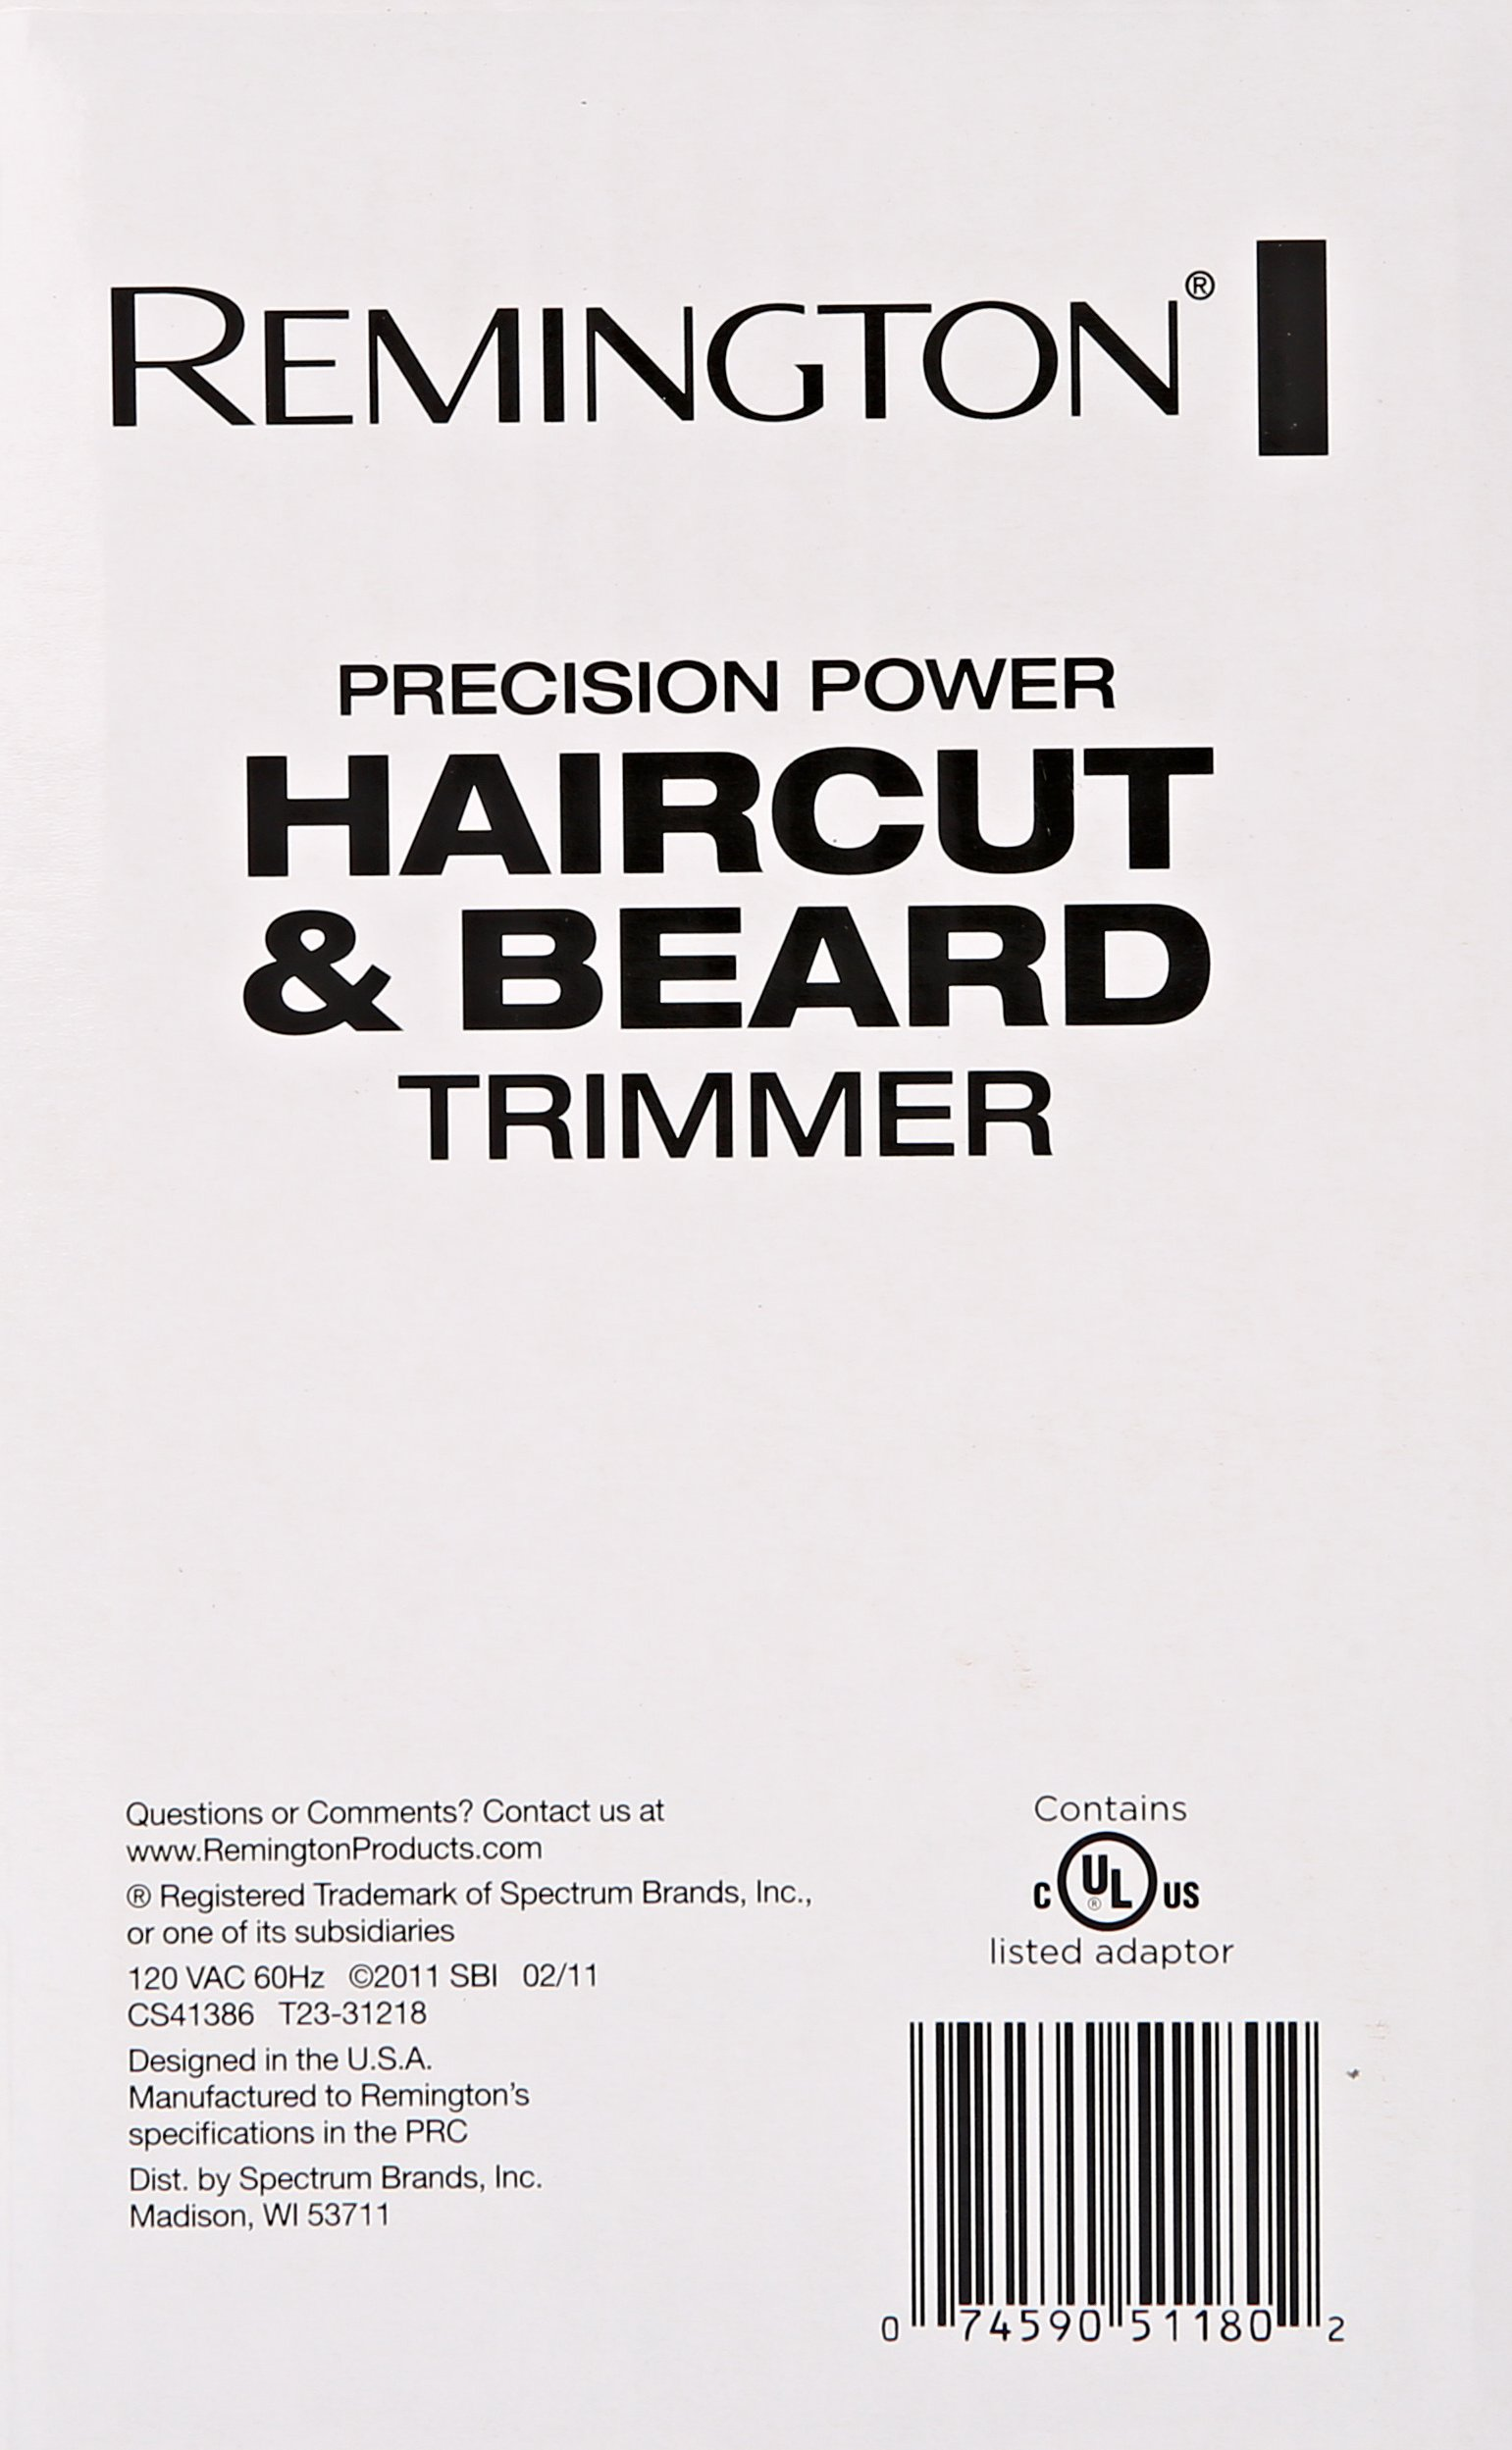 Remington HC5550AM Precision Power Haircut & Beard Trimmer, Hair Clippers, Beard Trimmer, Clippers by Remington (Image #6)